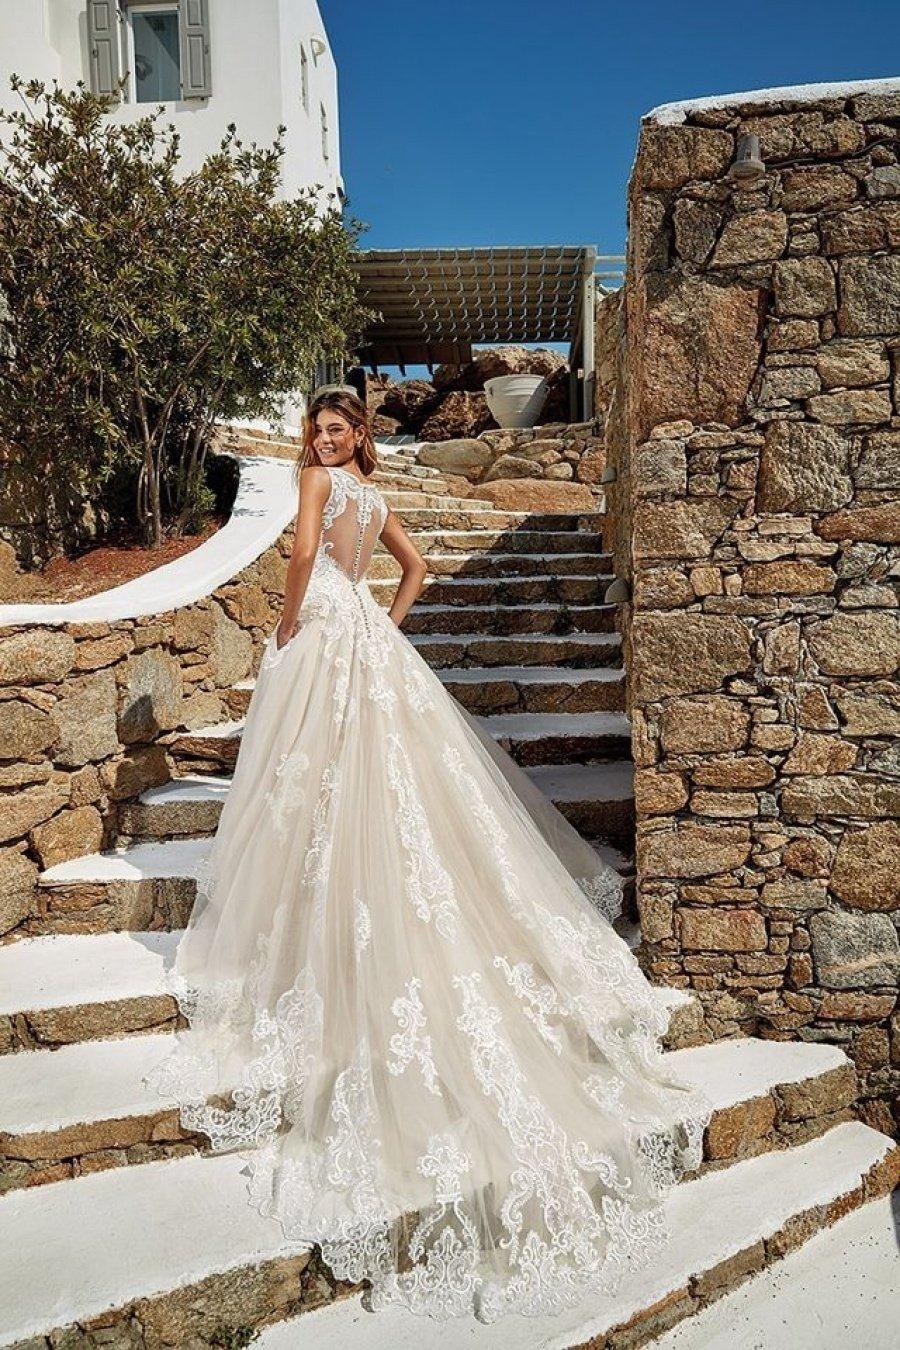 Sample Sales Clothing Bridal Fashion,Second Hand Wedding Dresses Uk Size 18